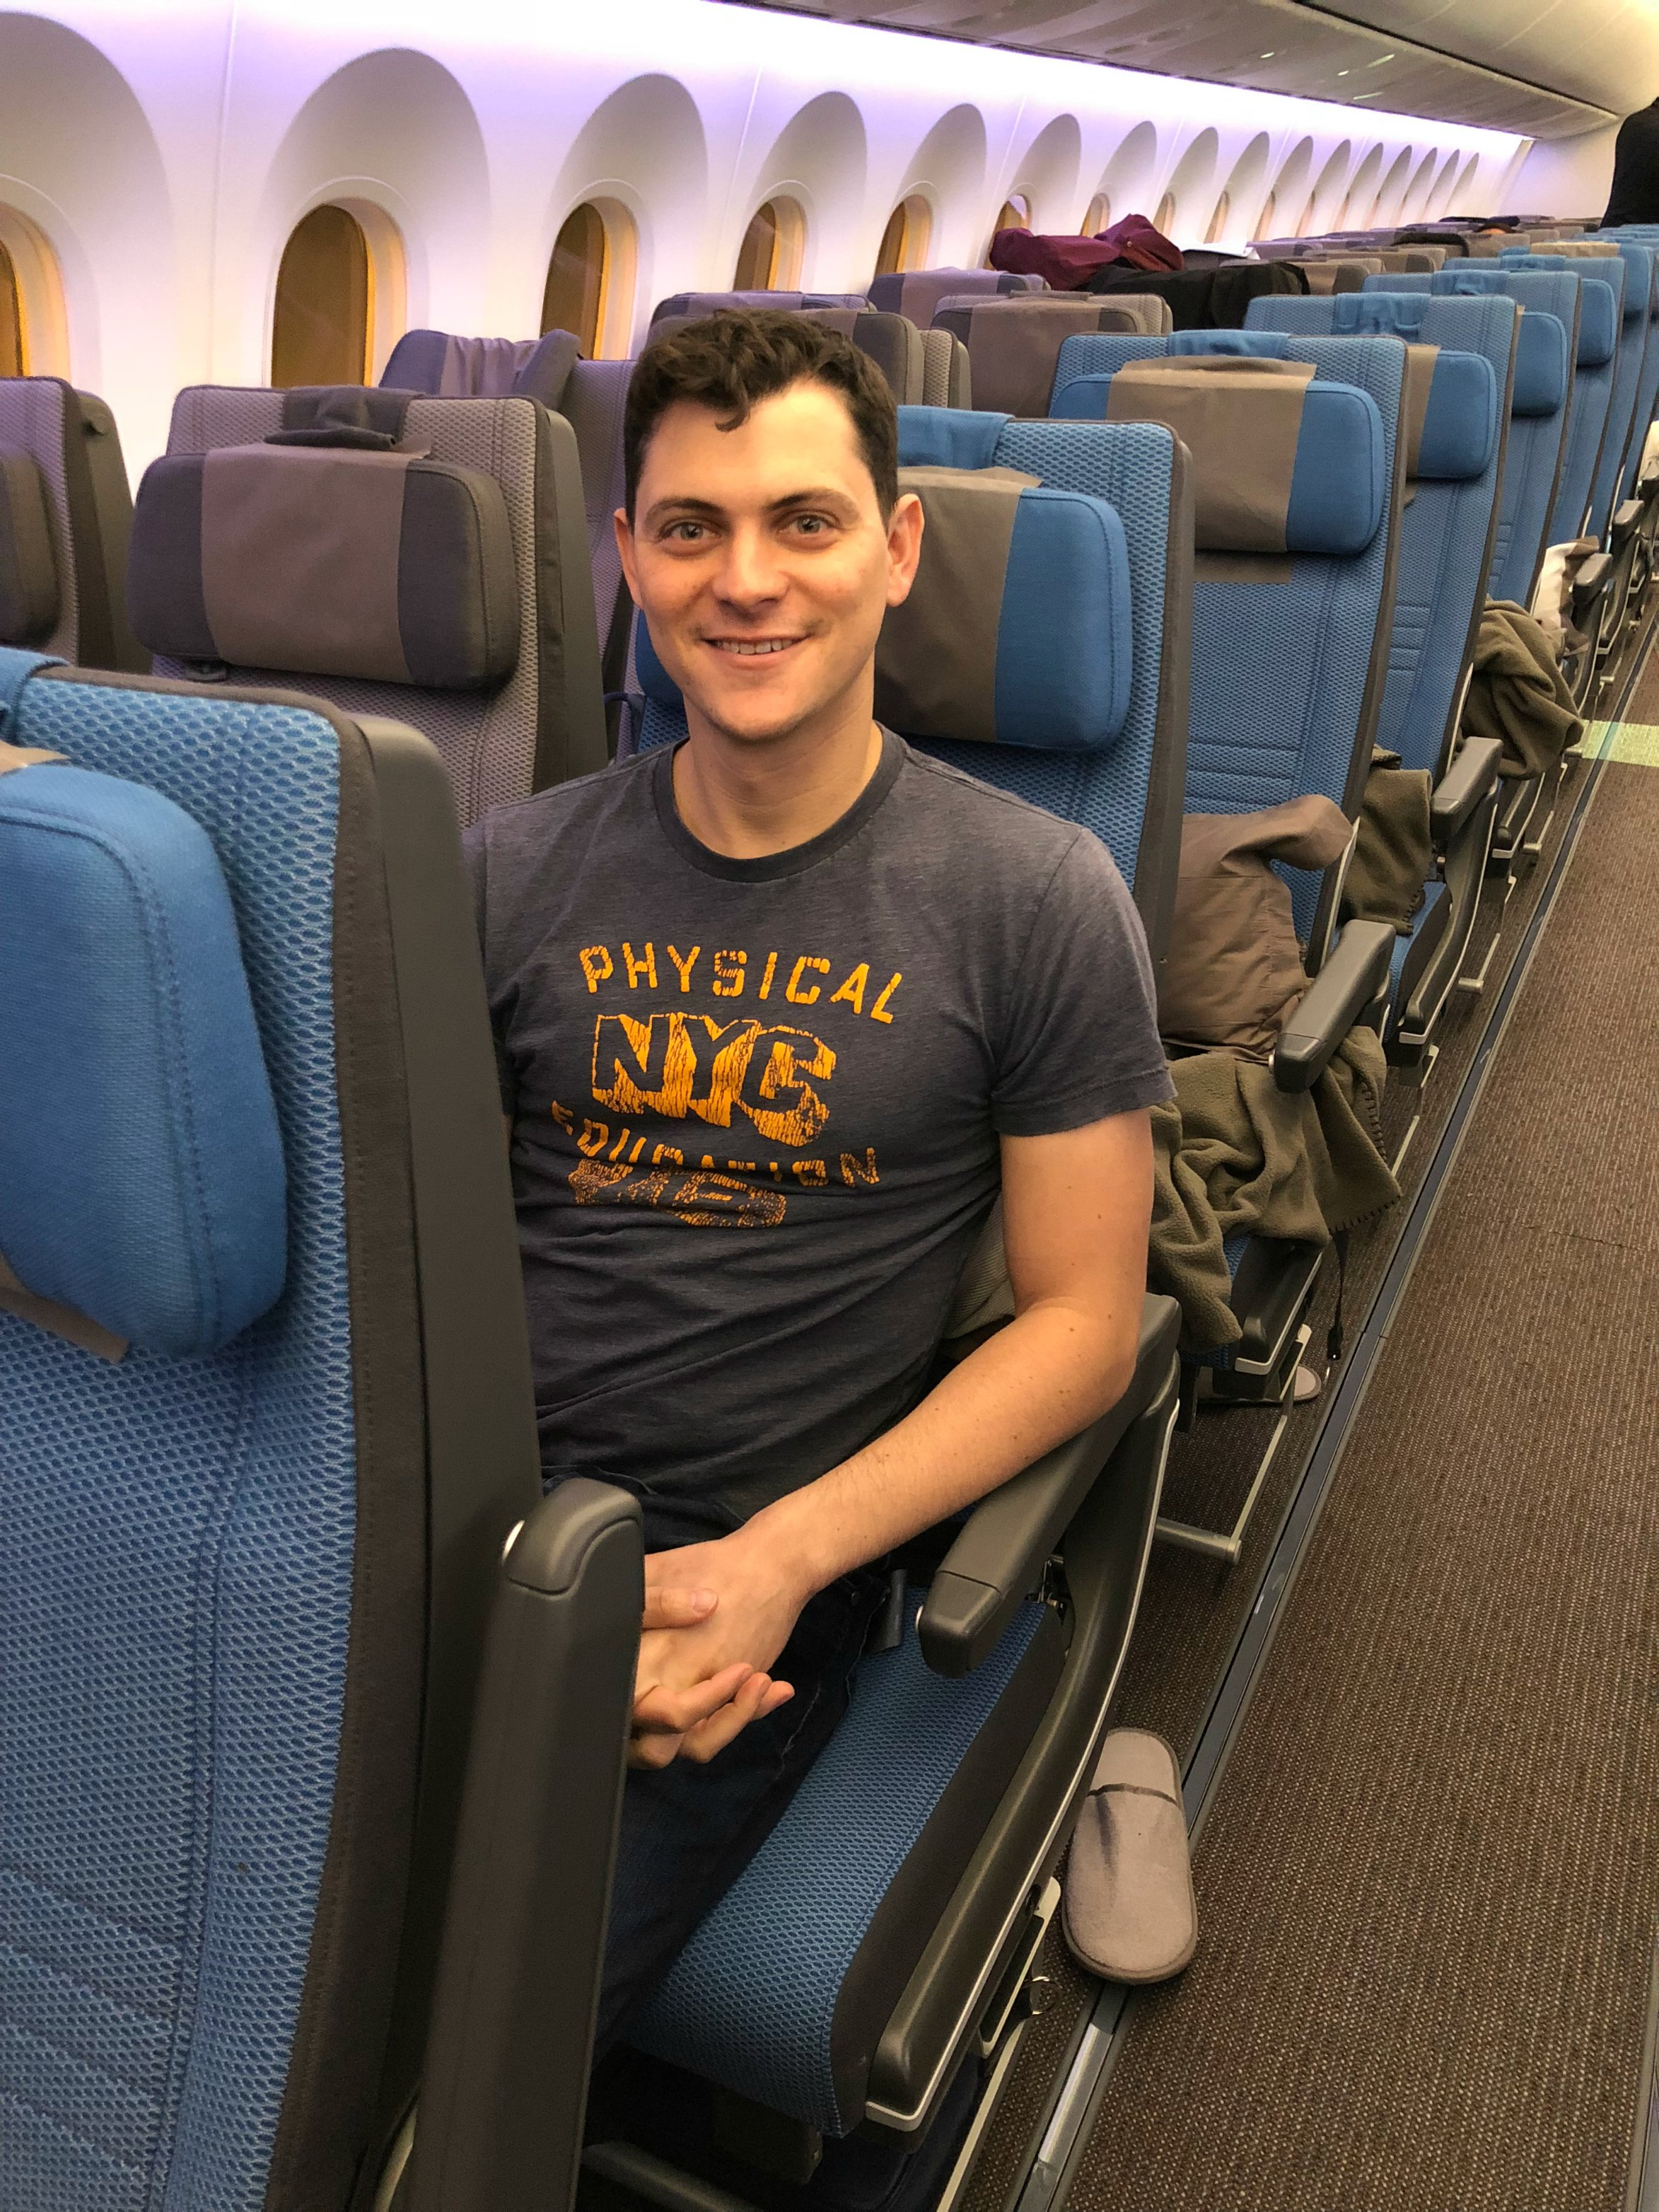 Matt Kepnes sitting in economy class on Singapore Airlines' new Dreamliner